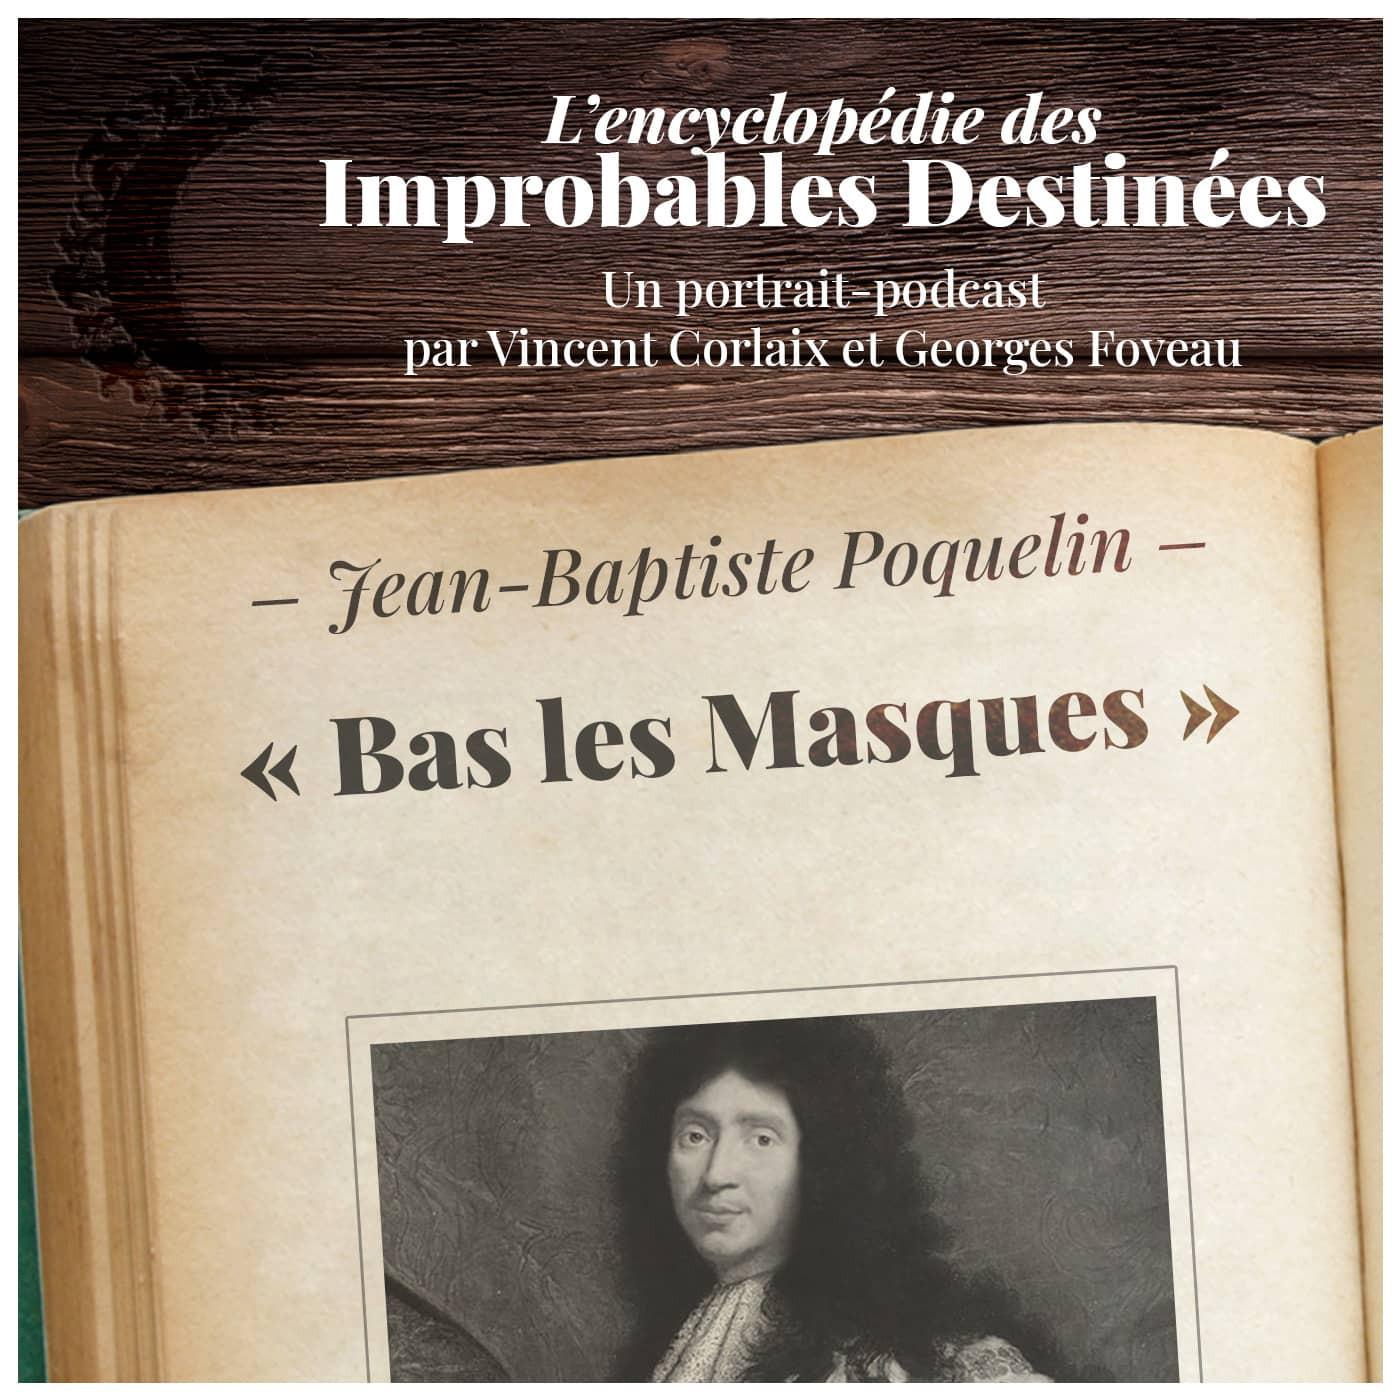 Jean-Baptiste Poquelin – Bas les masques